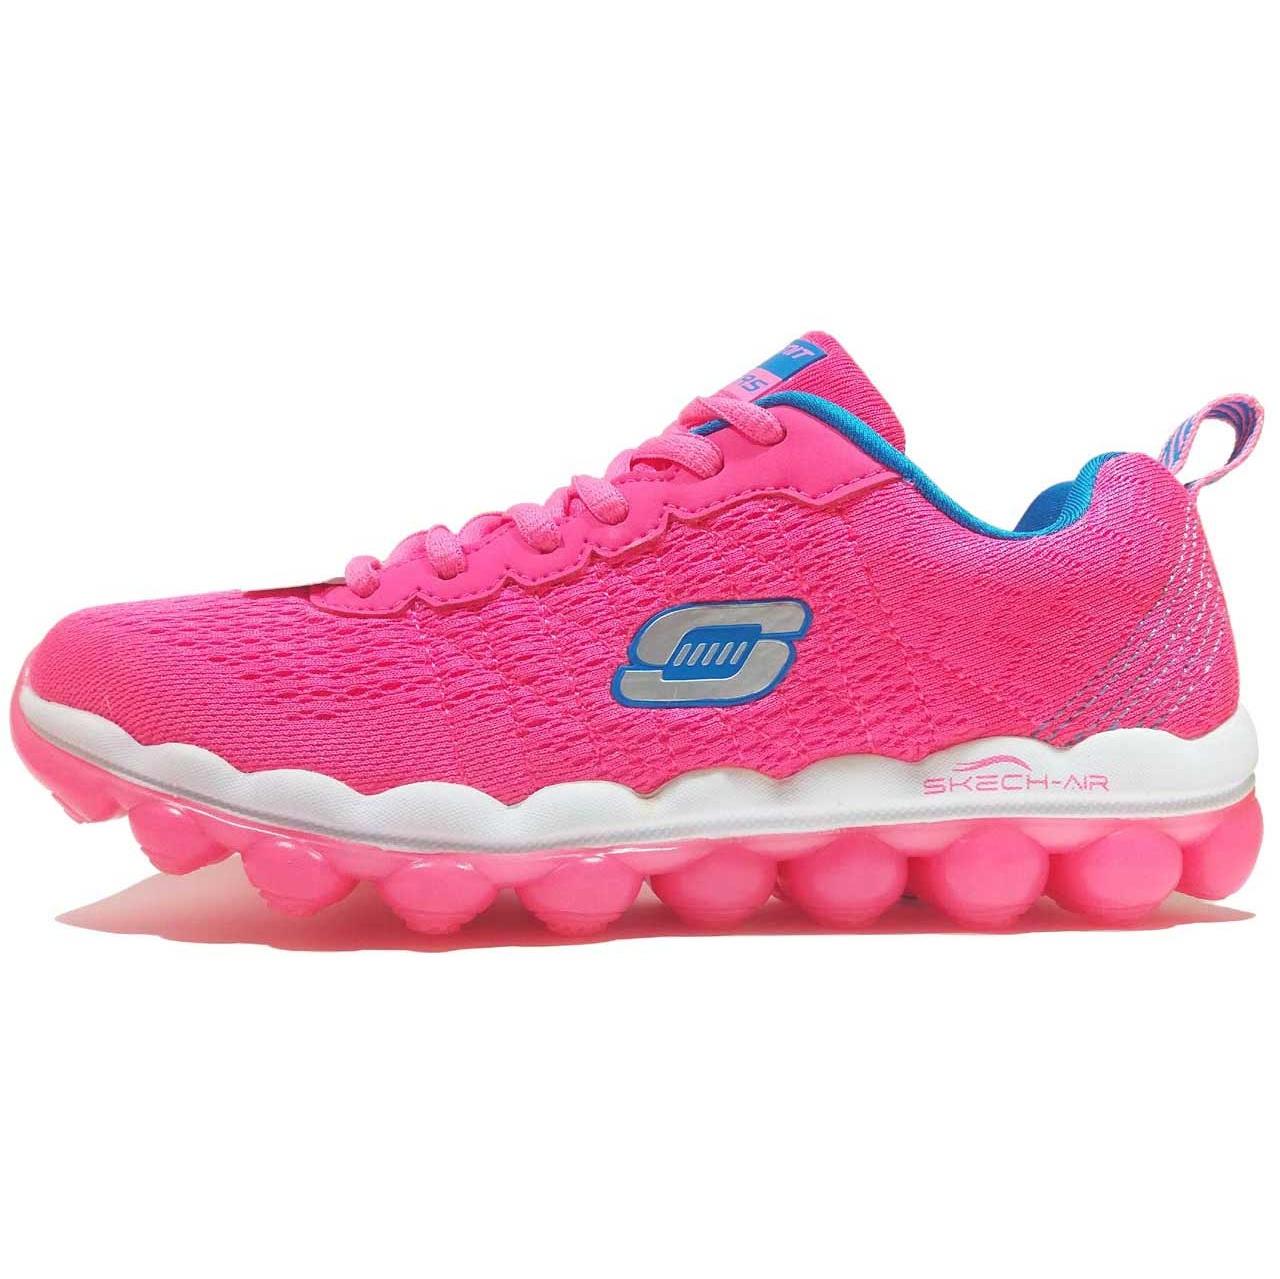 کفش مخصوص دویدن زنانه مدل Skech Air 2.0.6D682C